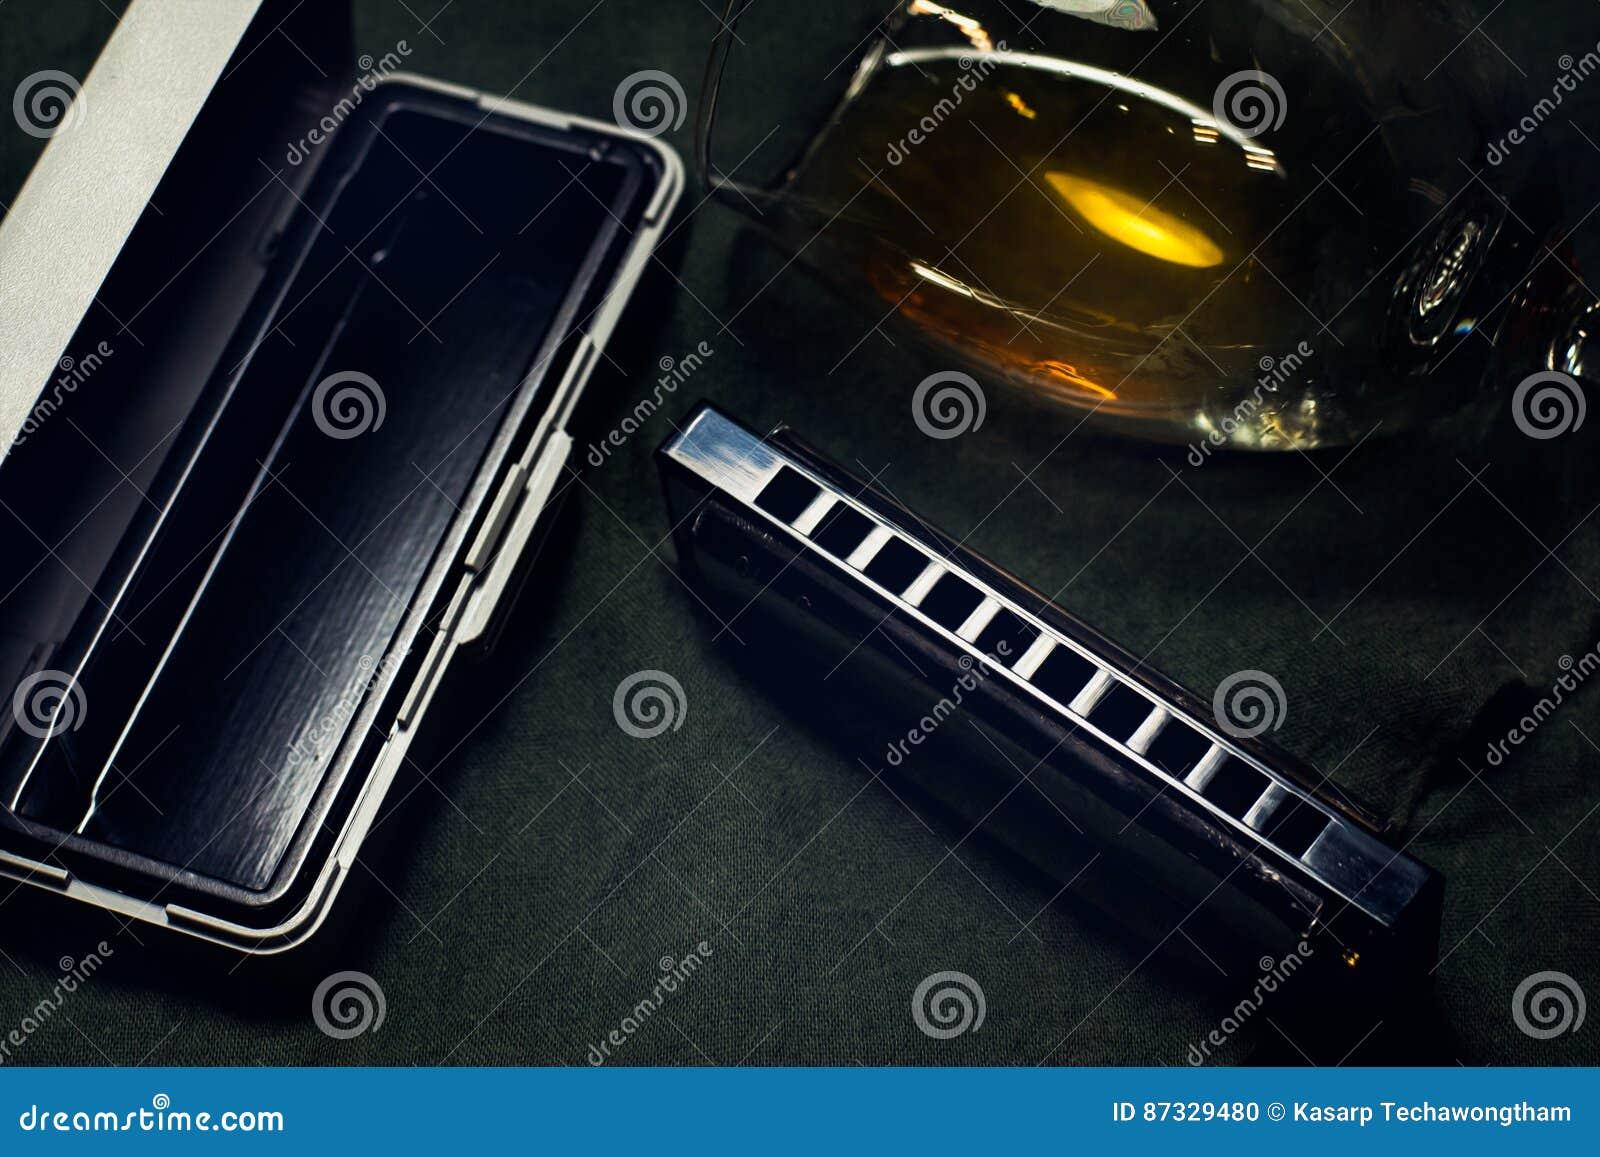 Harmonika s, Franse harpen of mondorgels blauwharp op donkere achtergrond